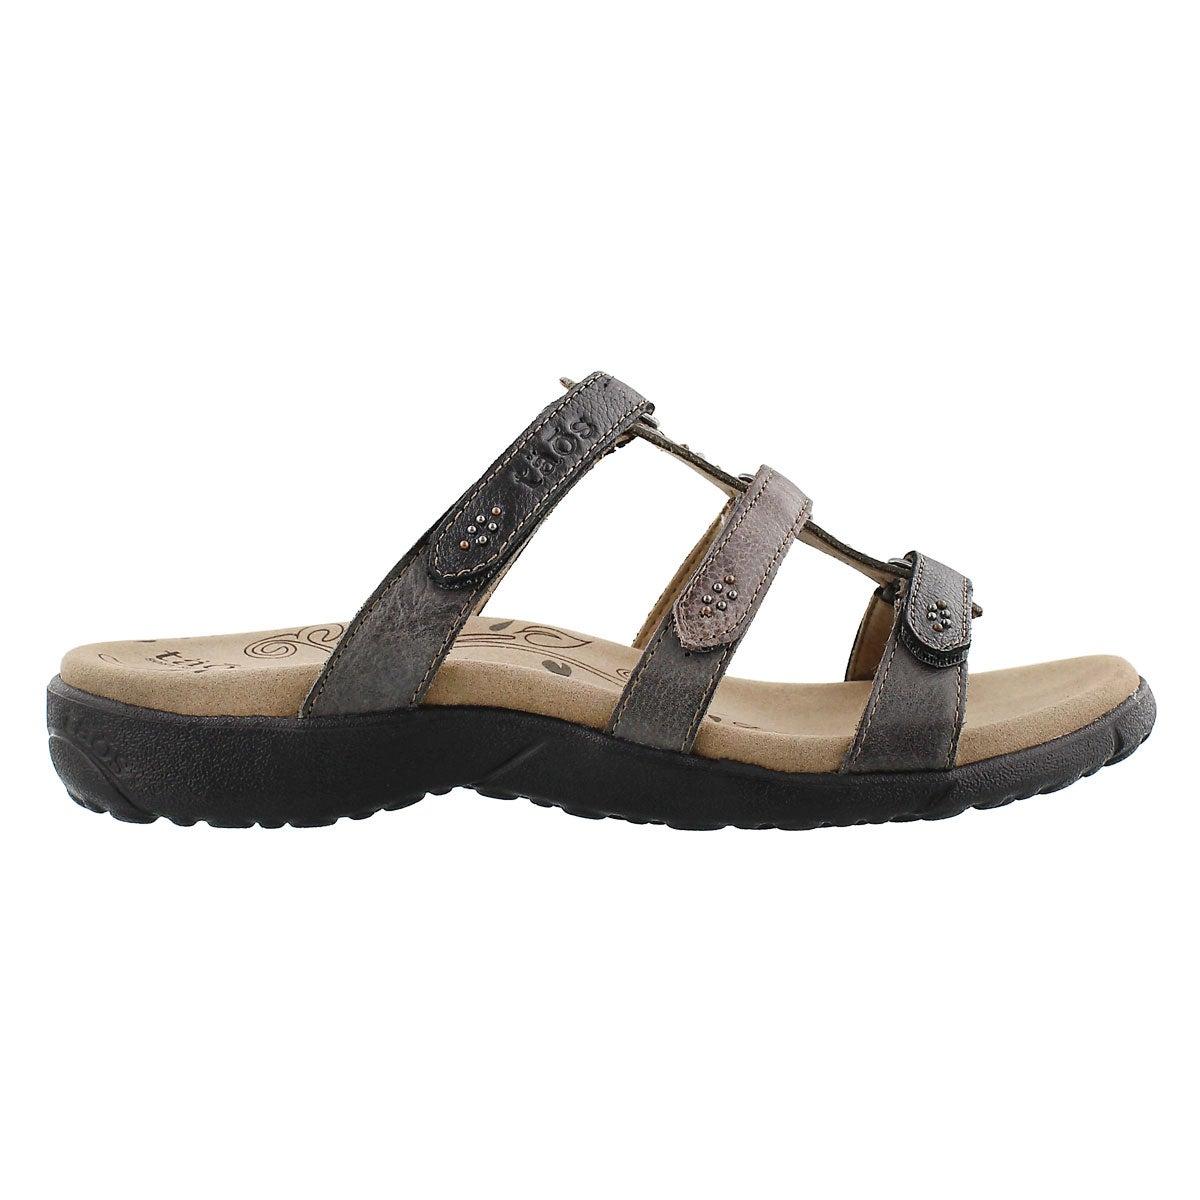 Sandale Tribute, gris/multi, femmes